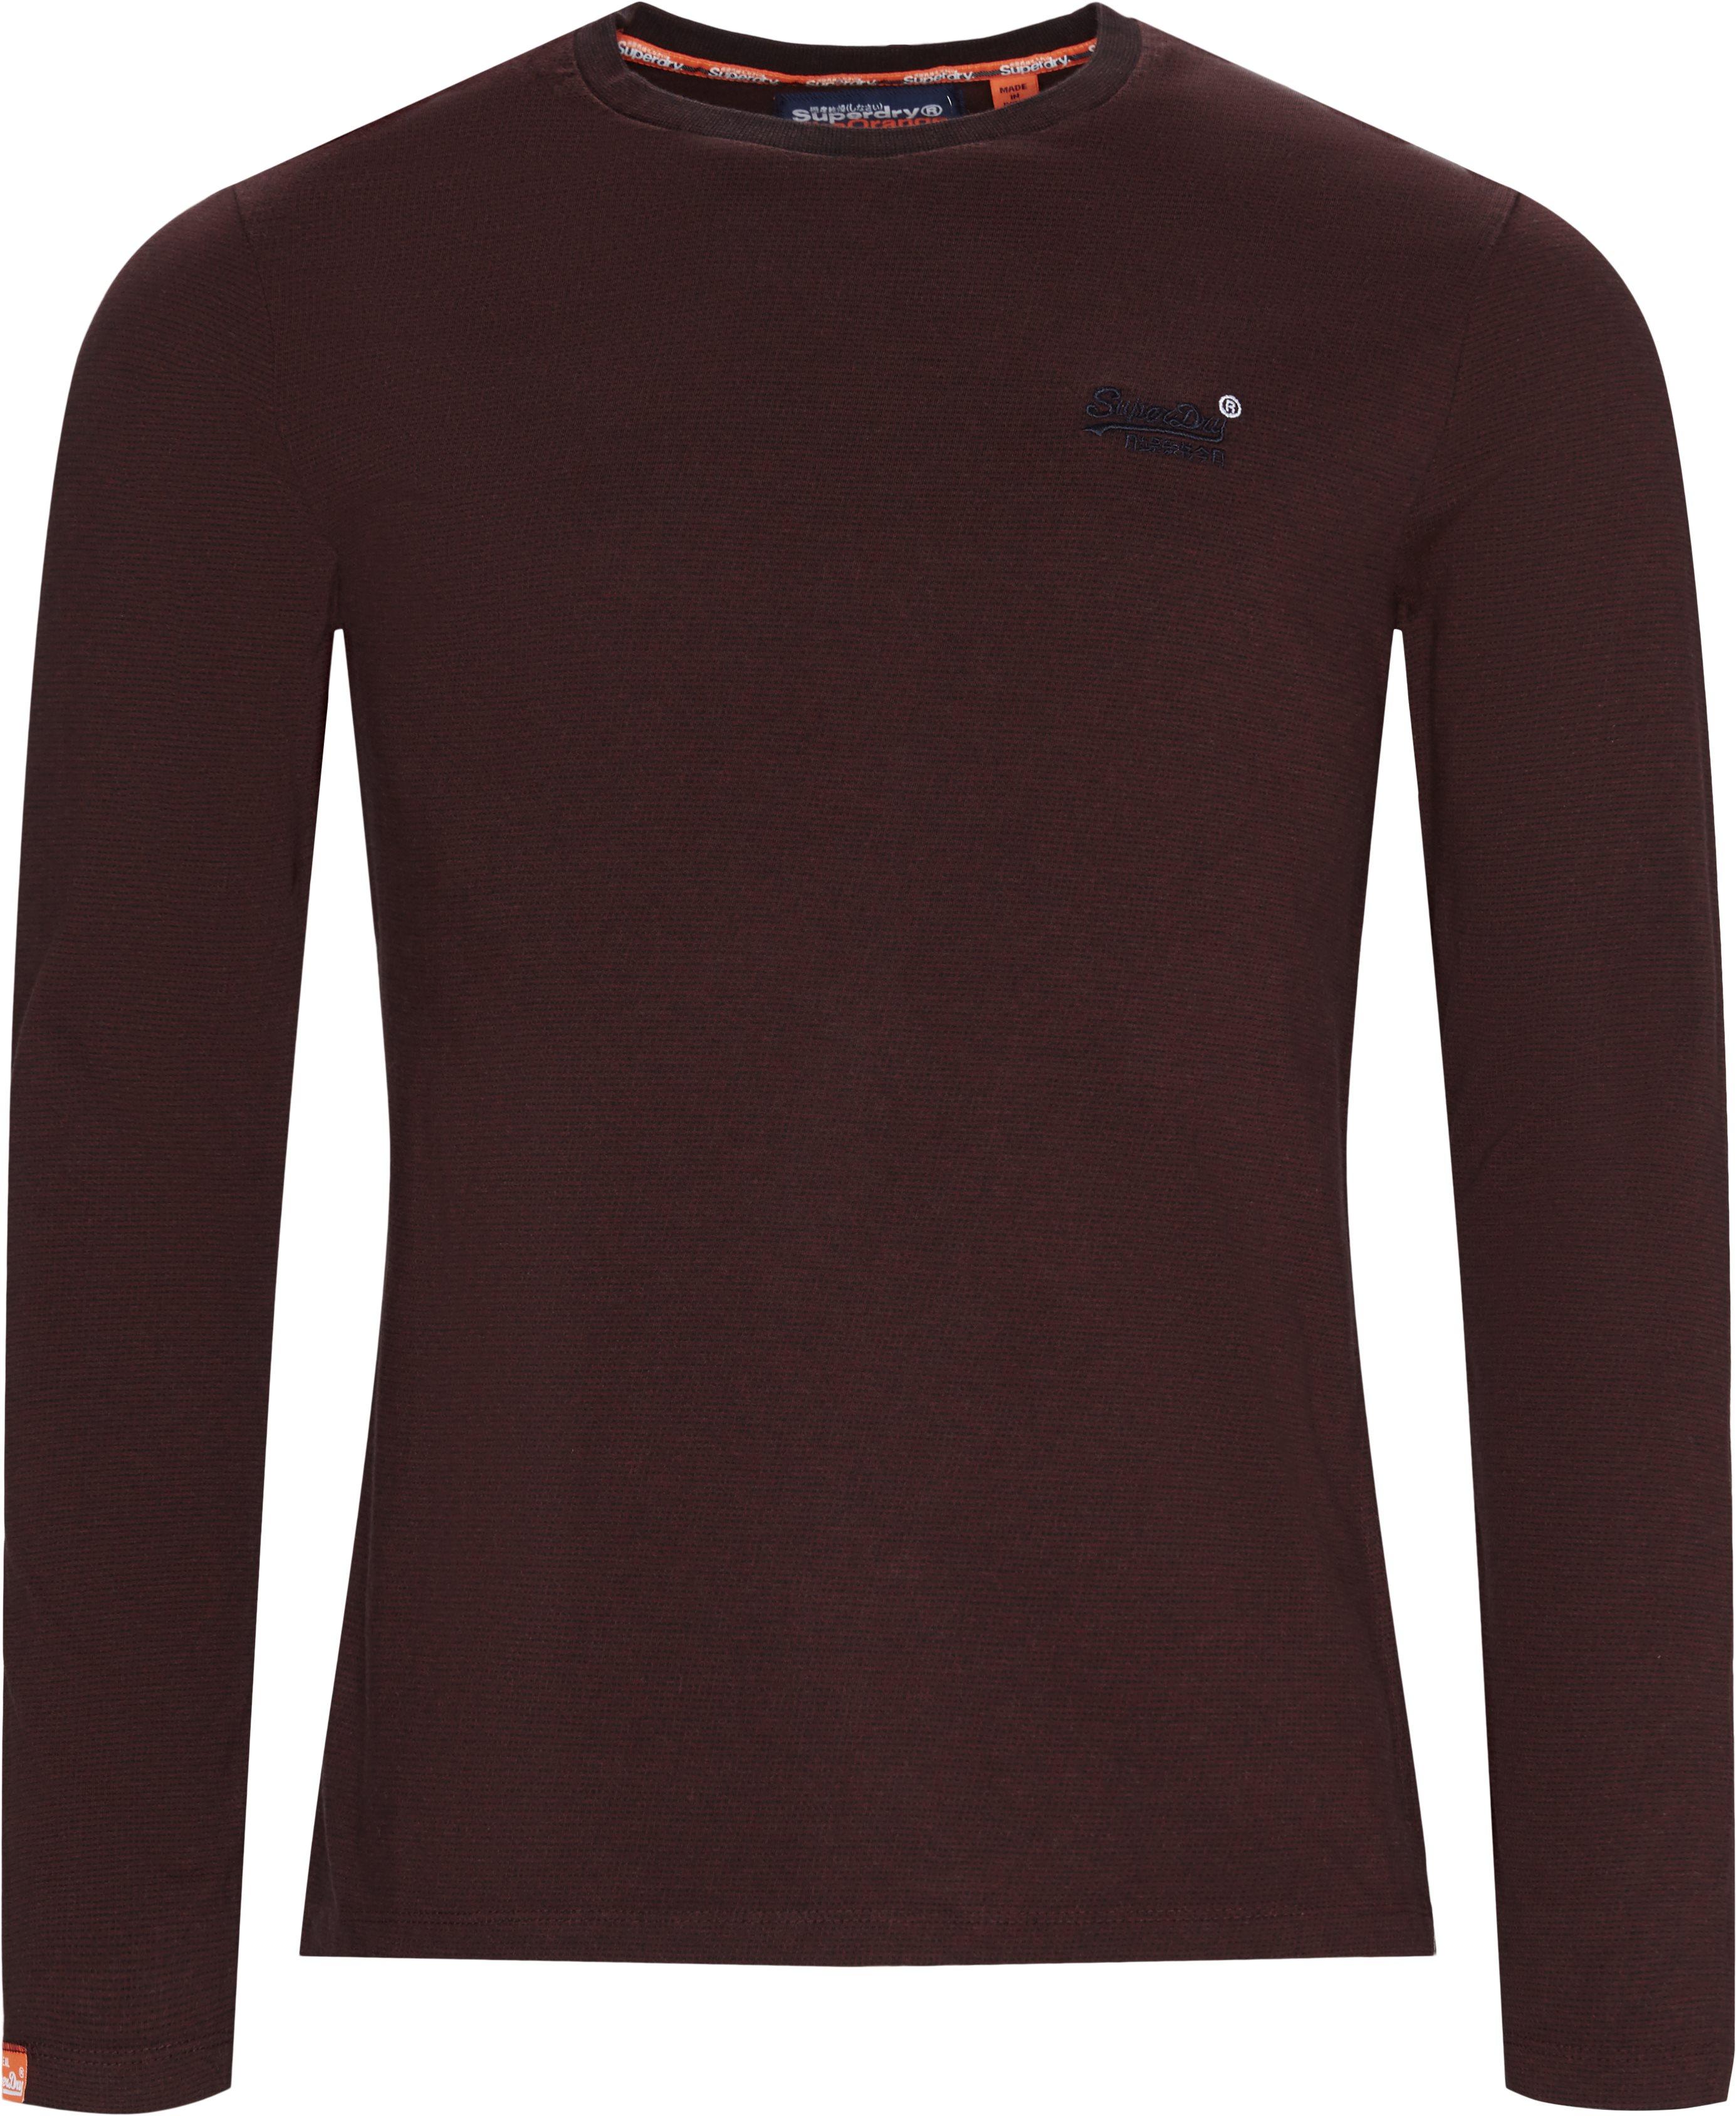 M6000 LS Tee - T-shirts - Regular fit - BORDEAUX